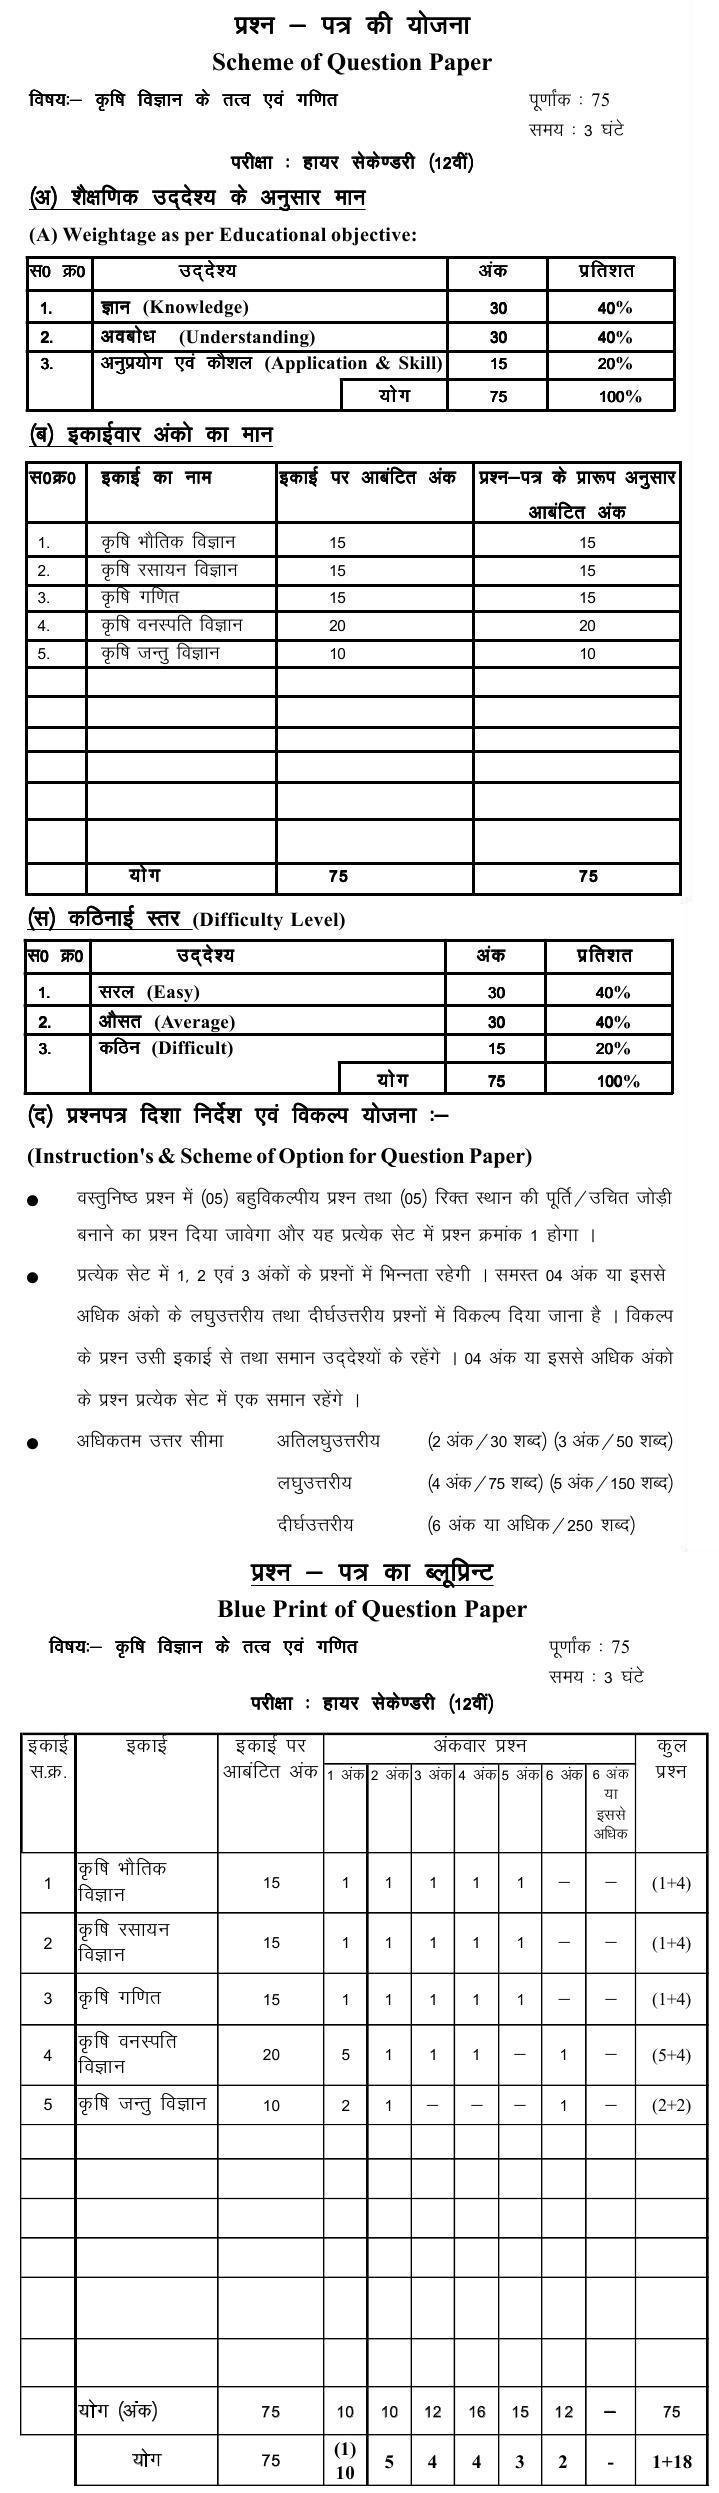 Chattisgarh Board Class 12 Scheme and Blue Print of Science of farming and maths (Krishi vigyan e tatva evam ganit)